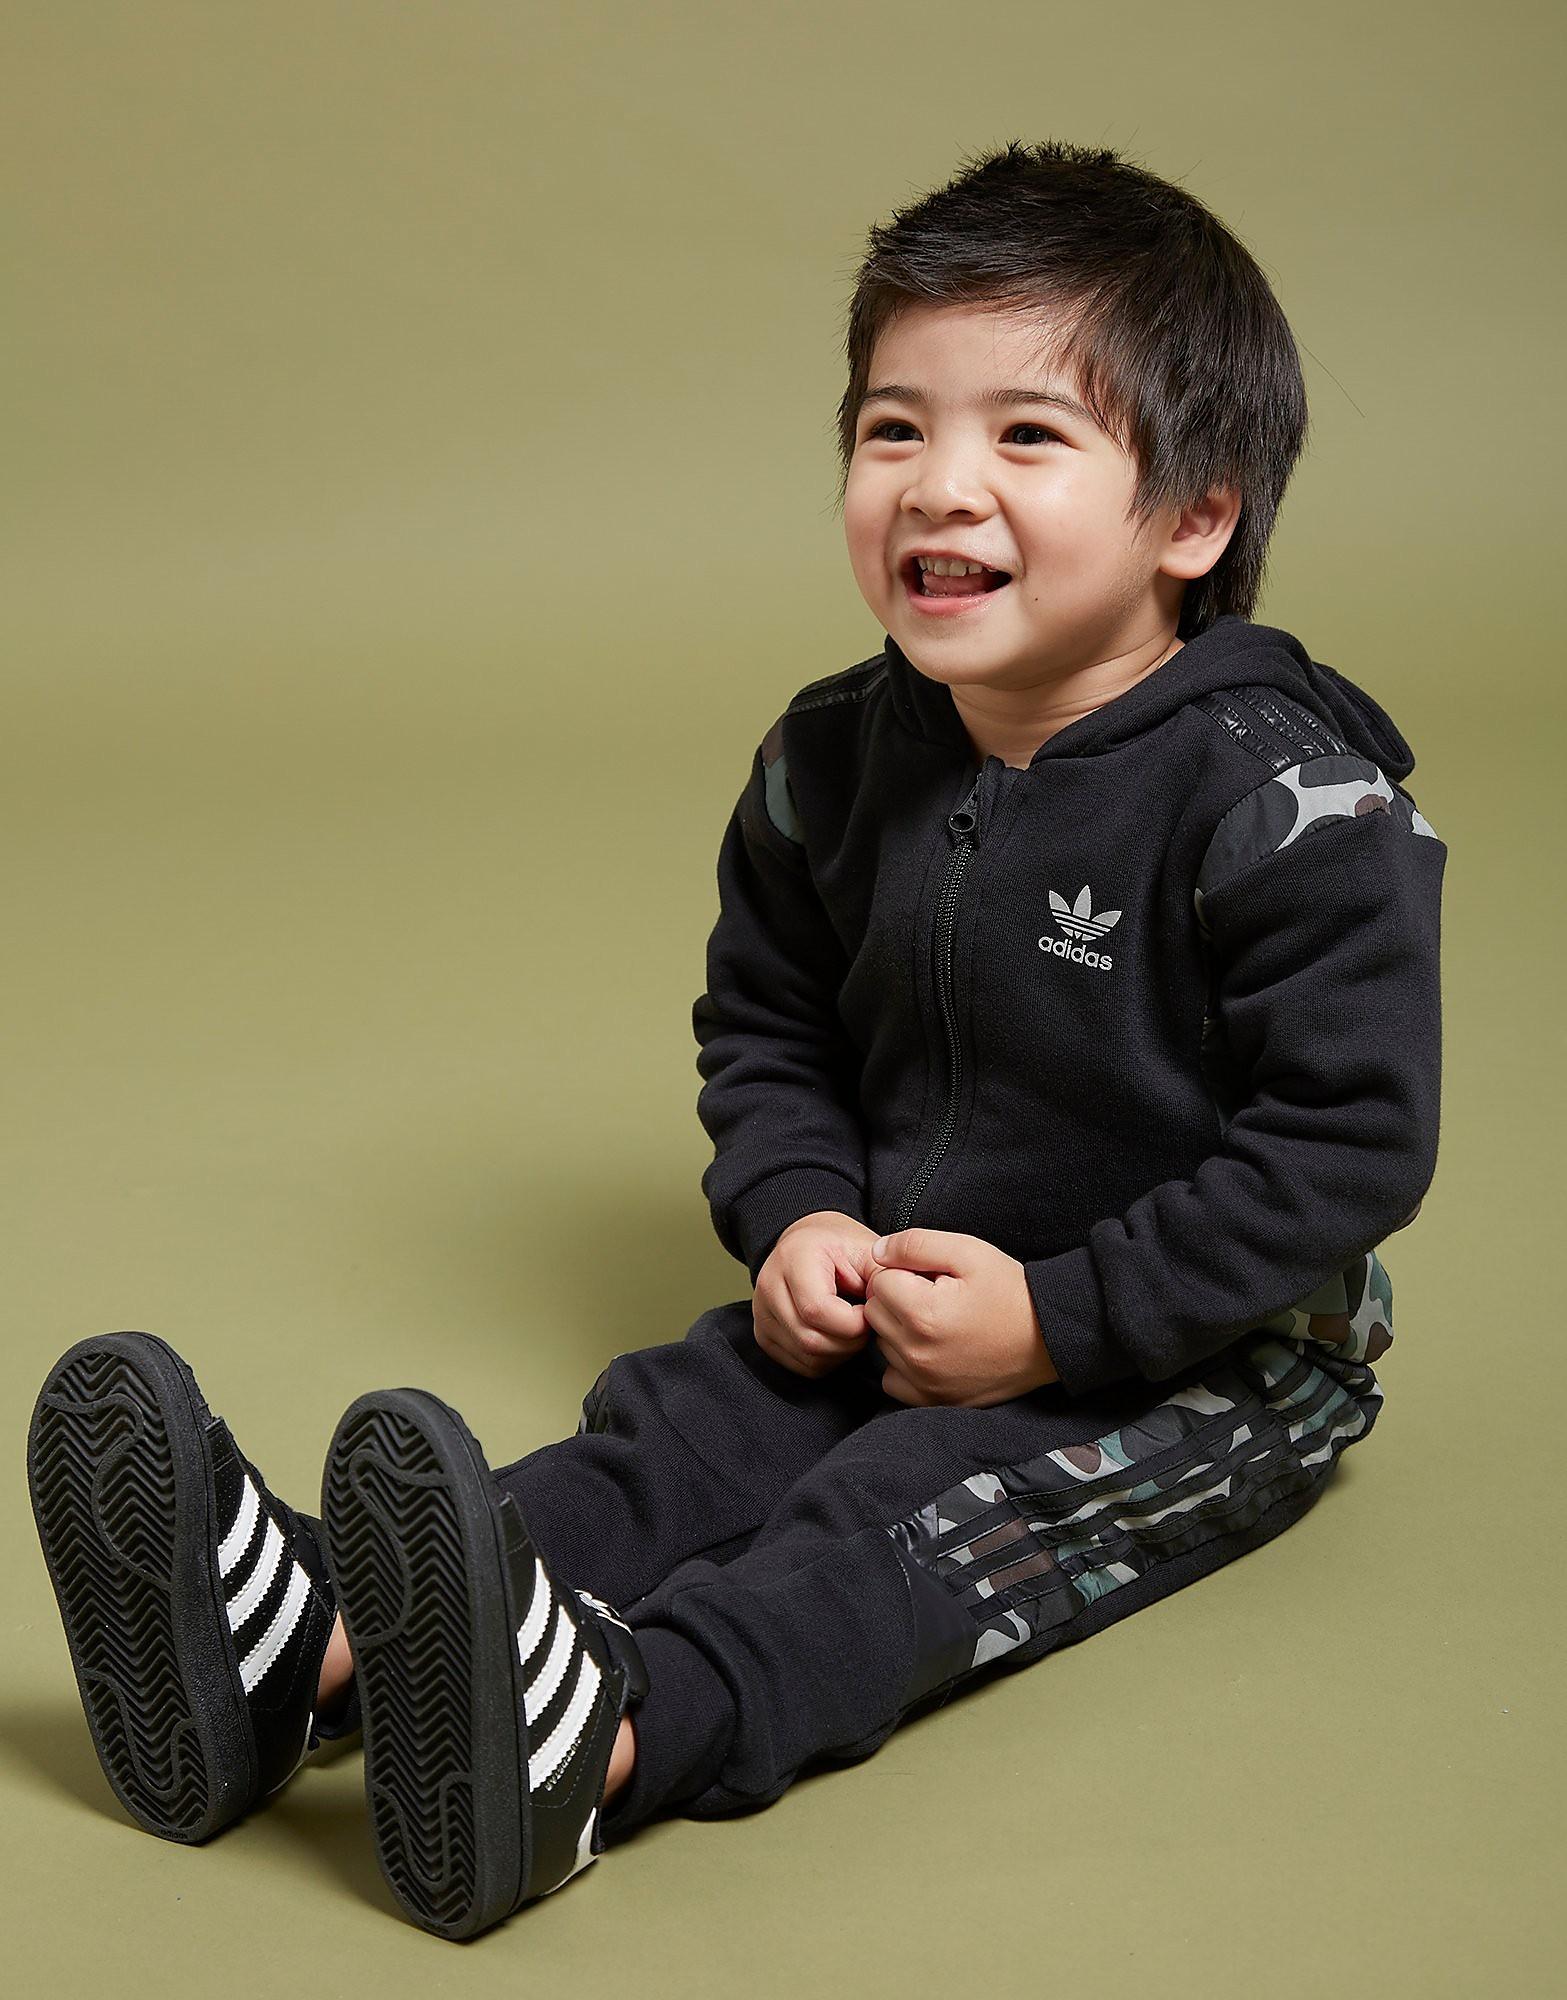 adidas Originals Europa Grafik Trainingsanzug Kleinkinder